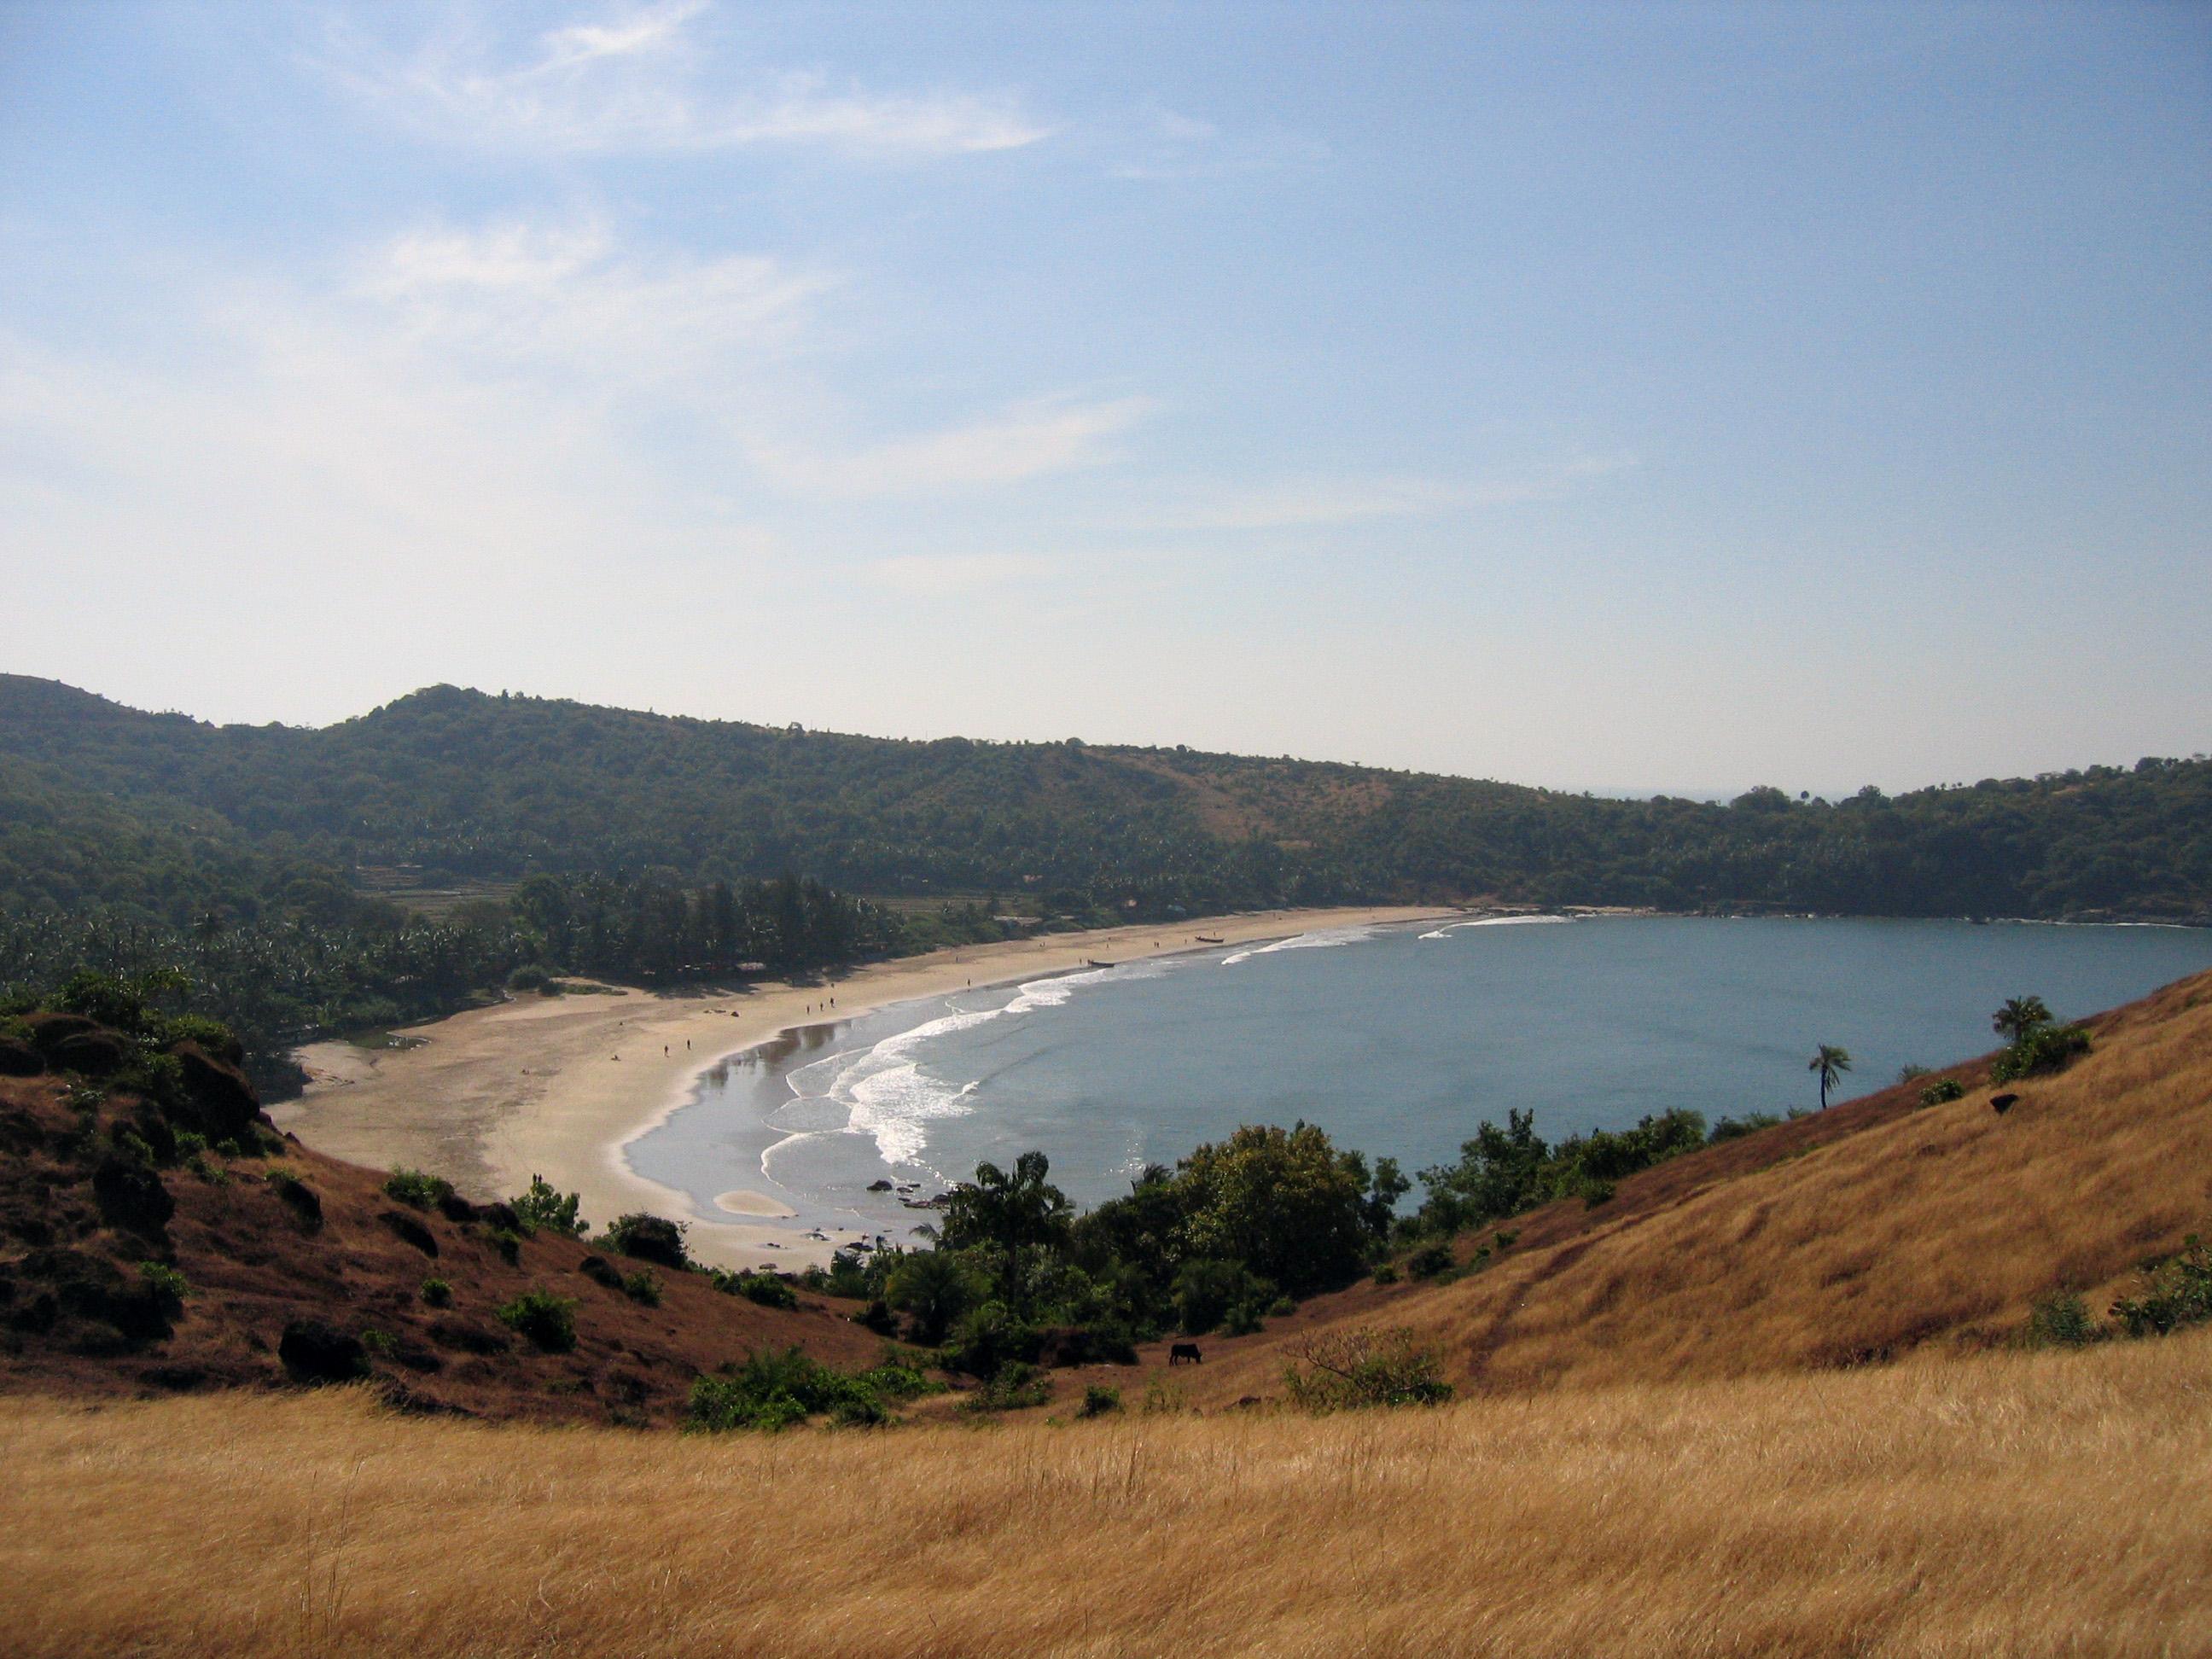 Kochi to Goa Tour - The Malabar Coast 6